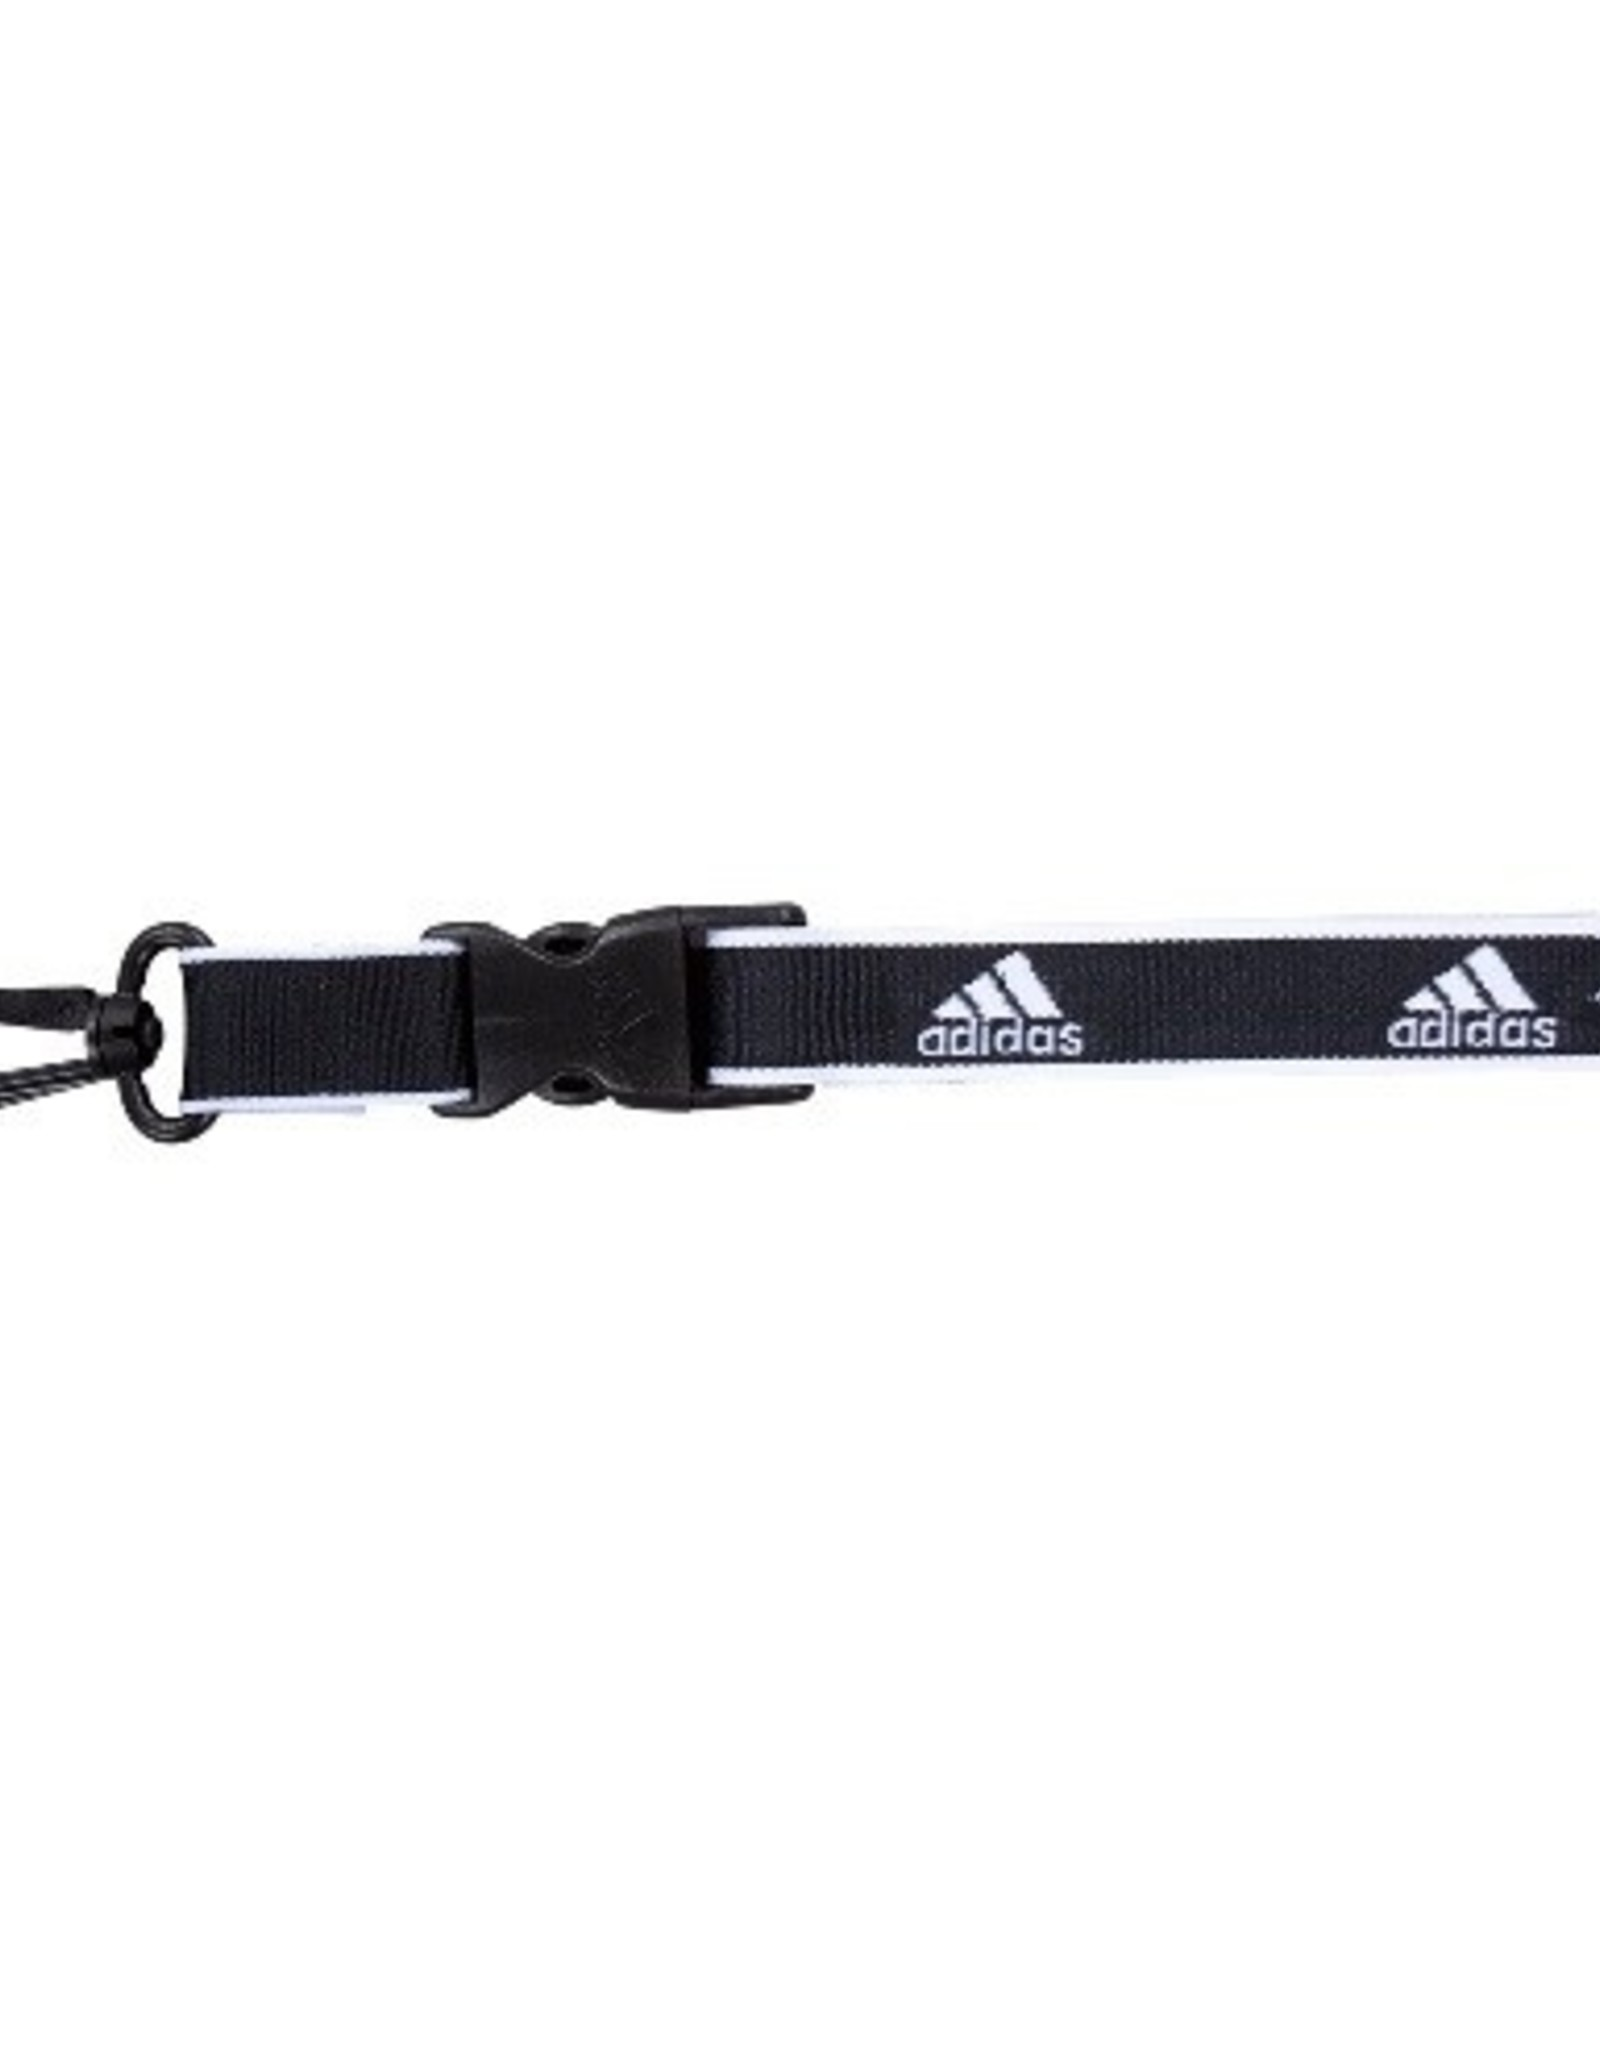 Adidas Adidas Wrist Lanyard